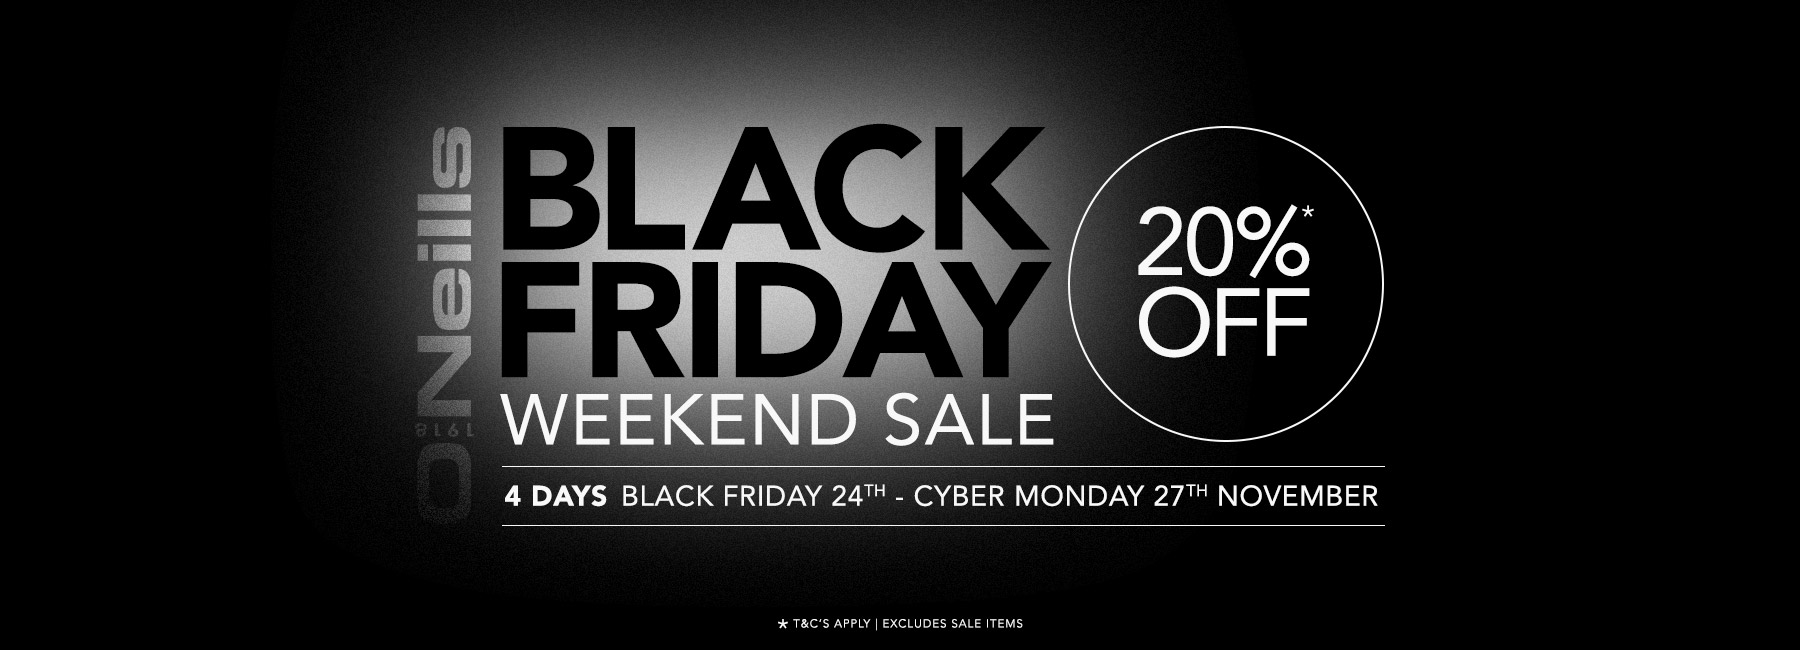 Black Friday | 20% Off